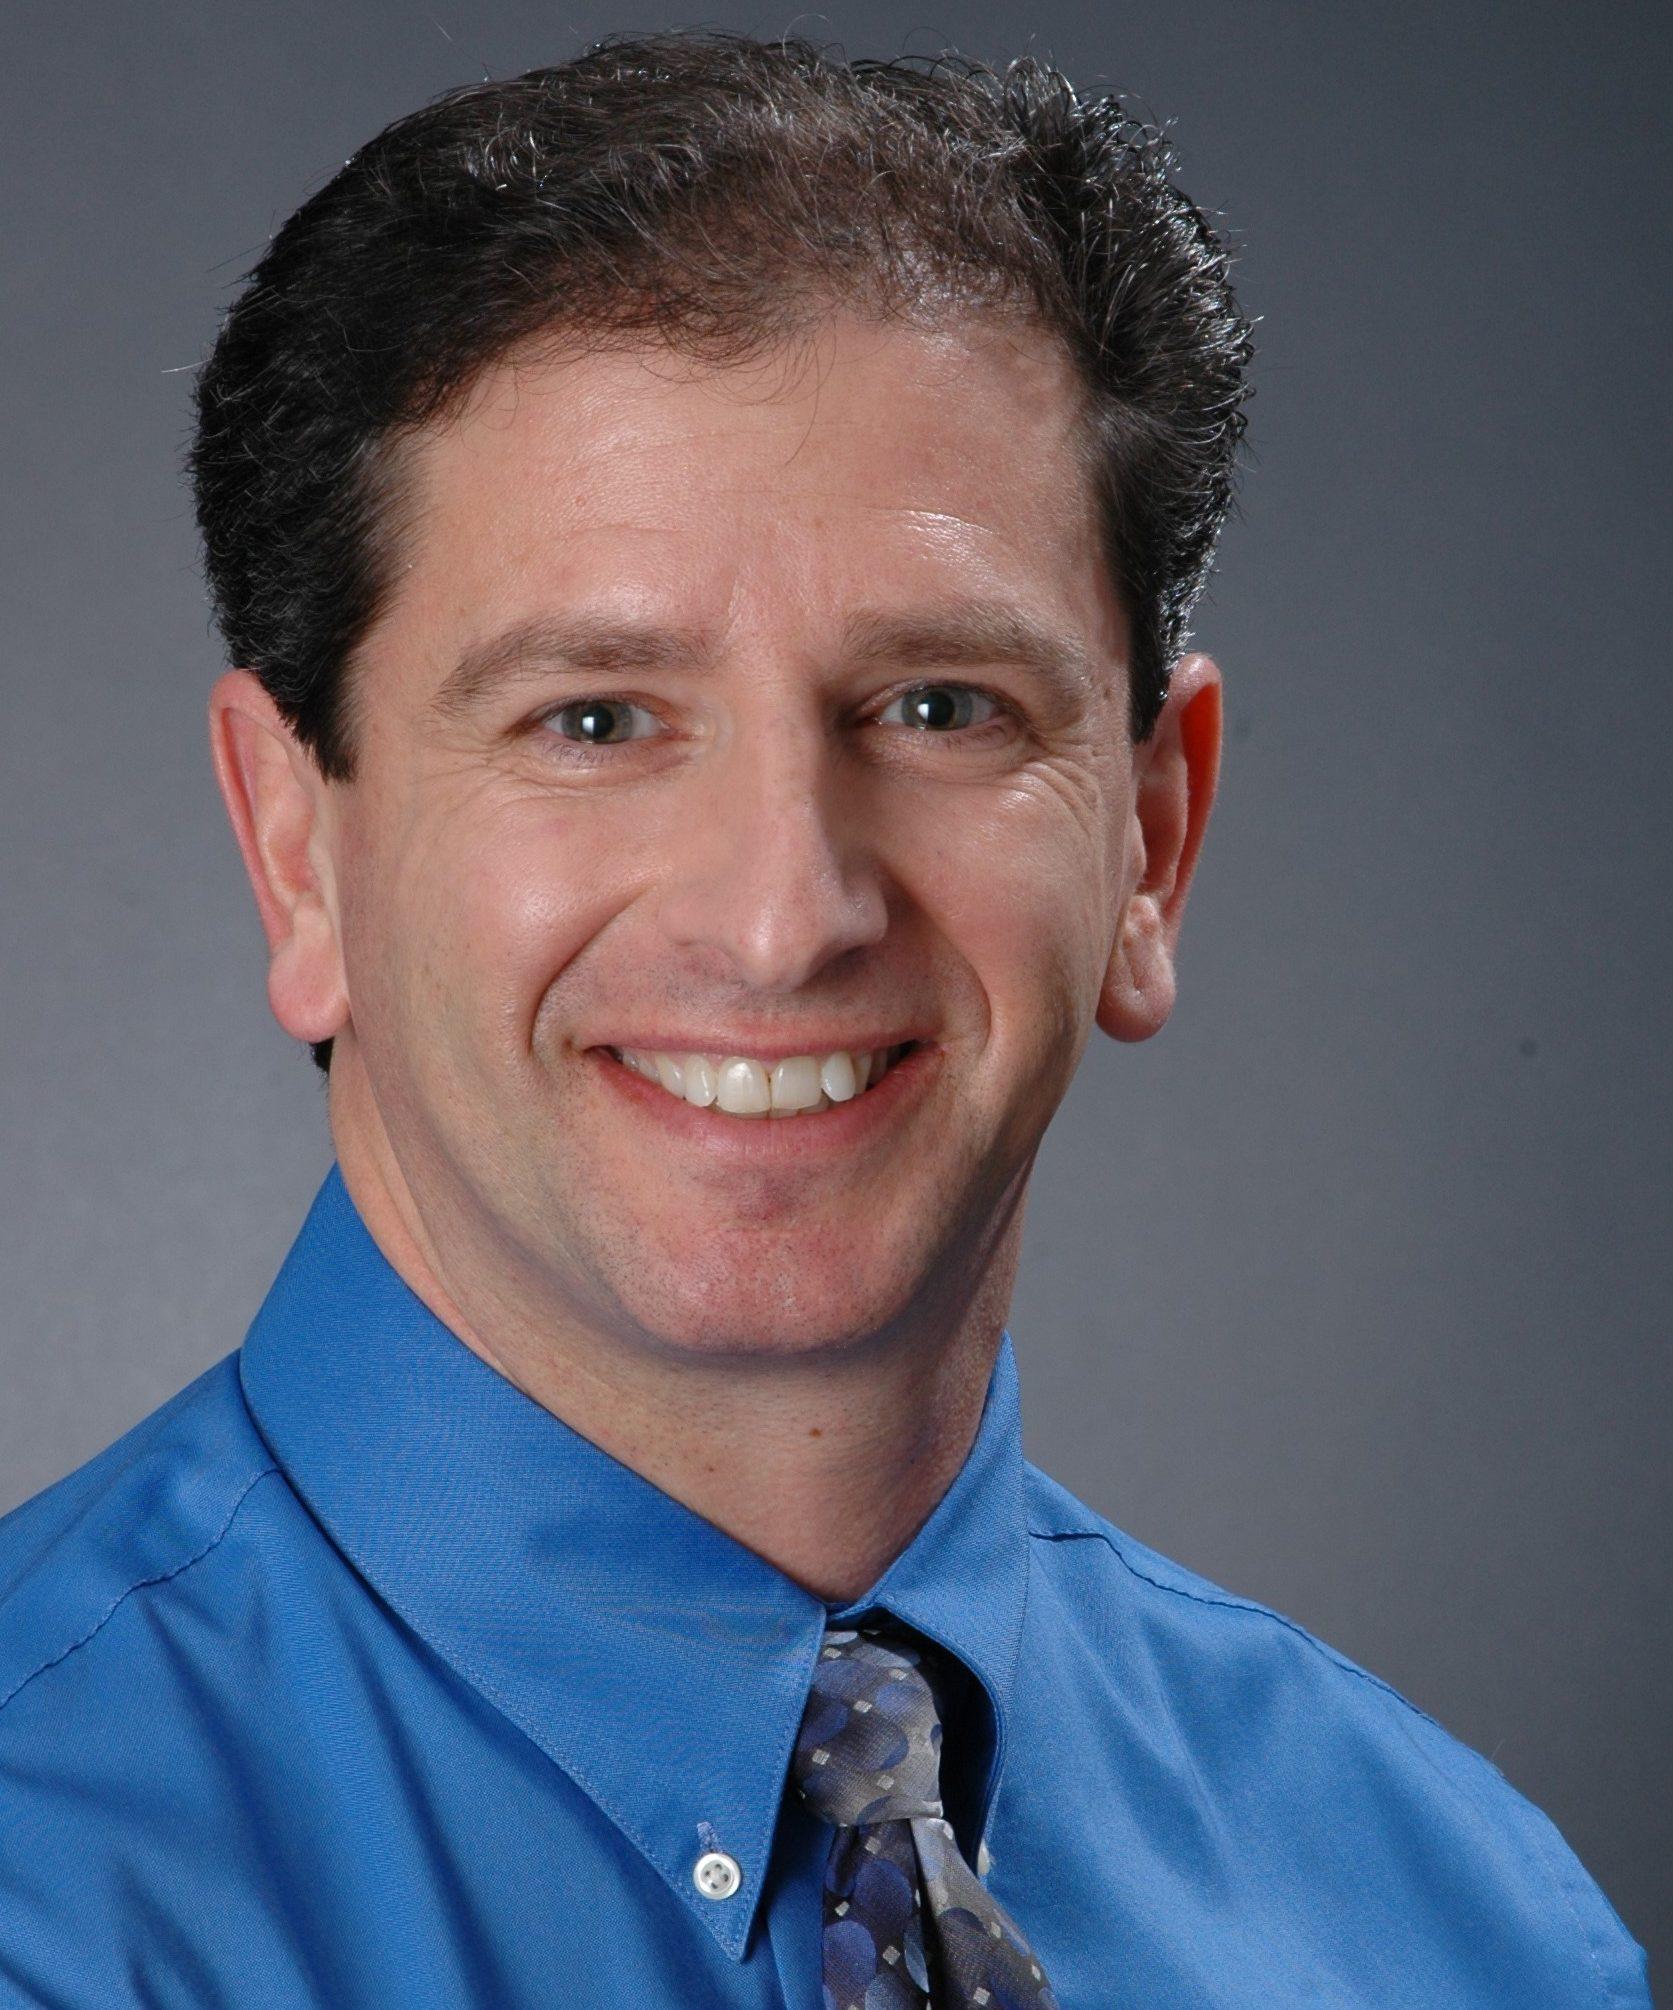 PAVE Welcomes Michael Dreiblatt